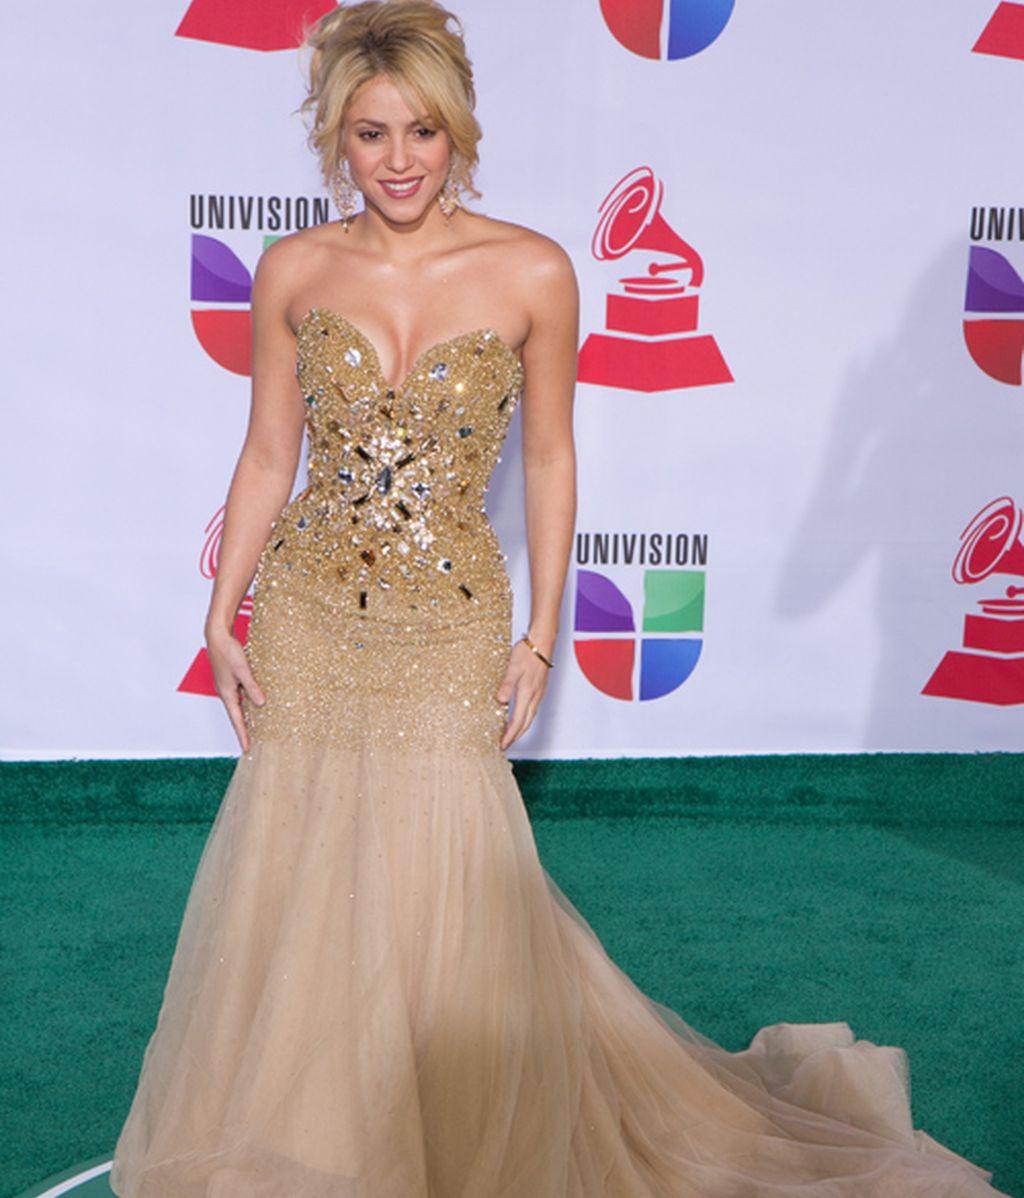 Shakira, tres modelos ¿tres aciertos o tres errores garrafales?